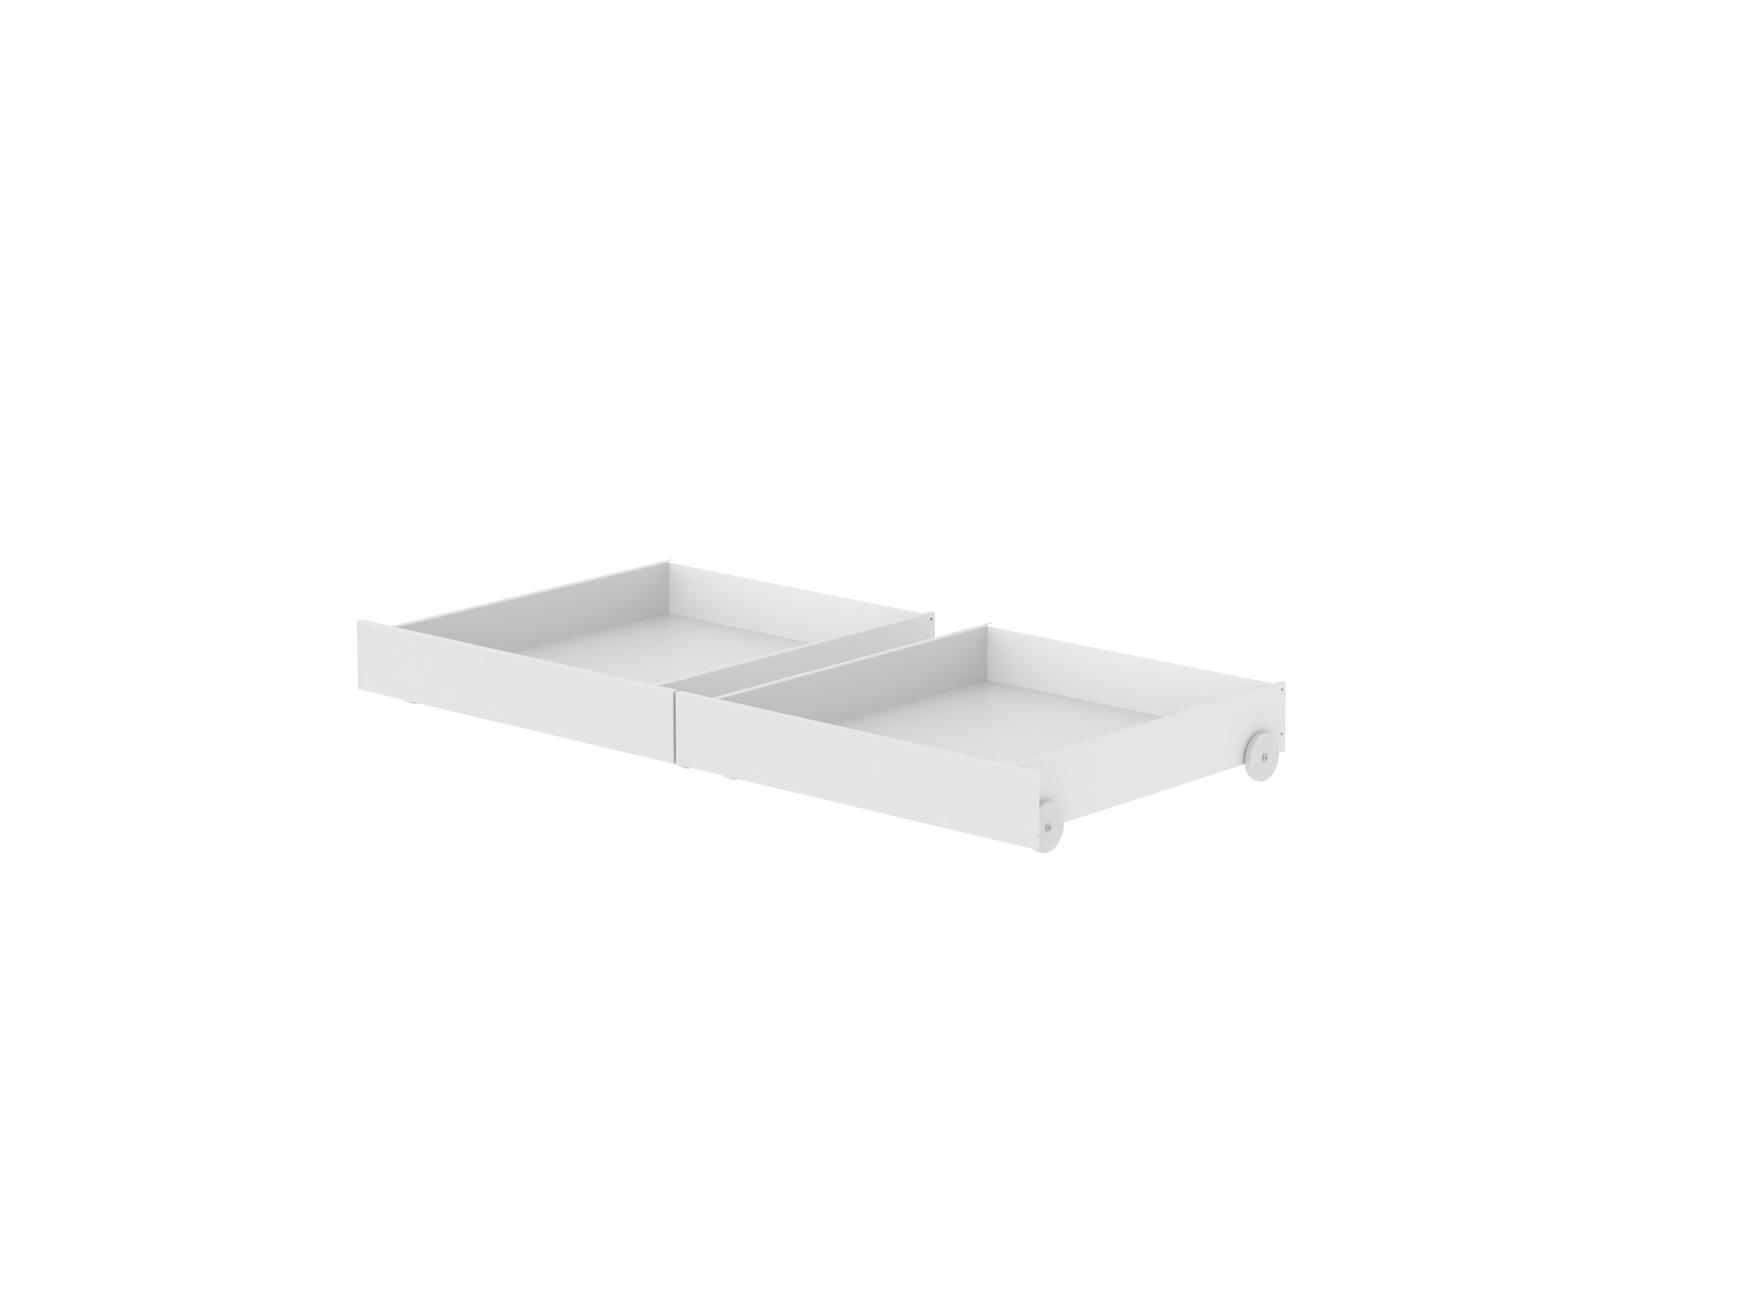 FLEXA Shop Lissone - Set di 2 cassetti